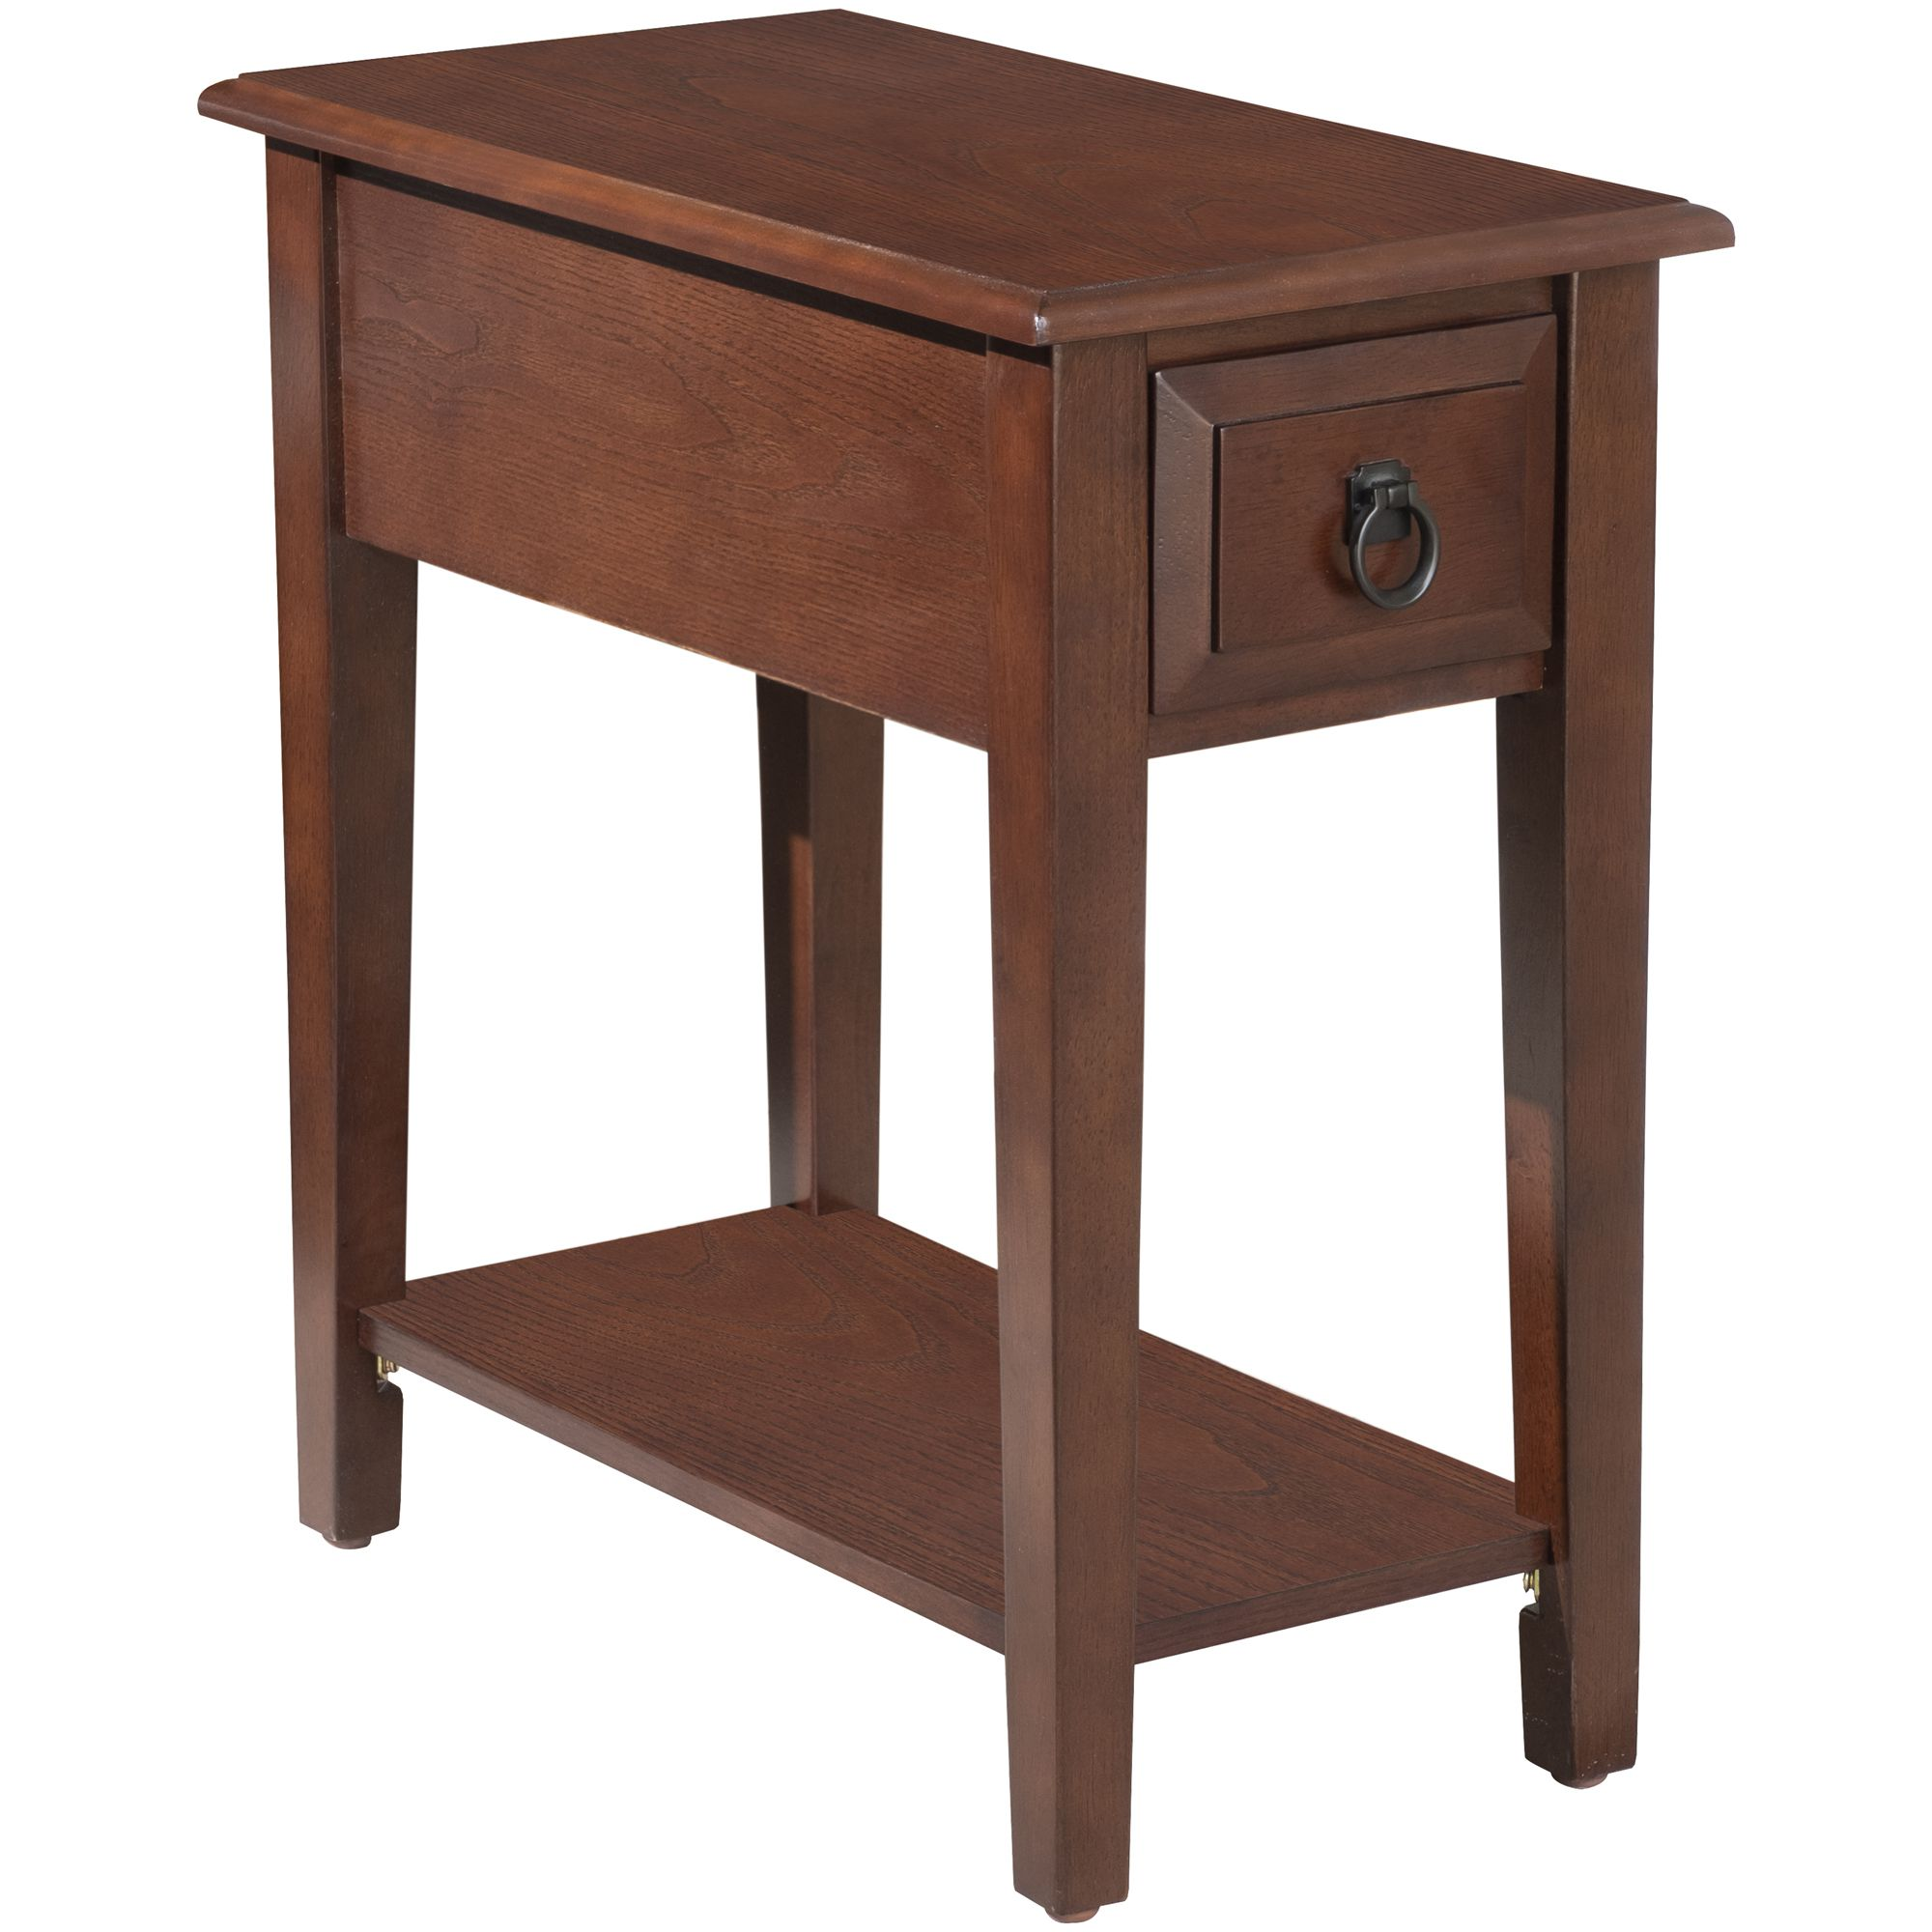 homcom modern tier acacia wood end table side desk with drawer accent dark coffee aosom brass finish dining room sofa nautical chair coastal themed chandeliers bunnings umbrella